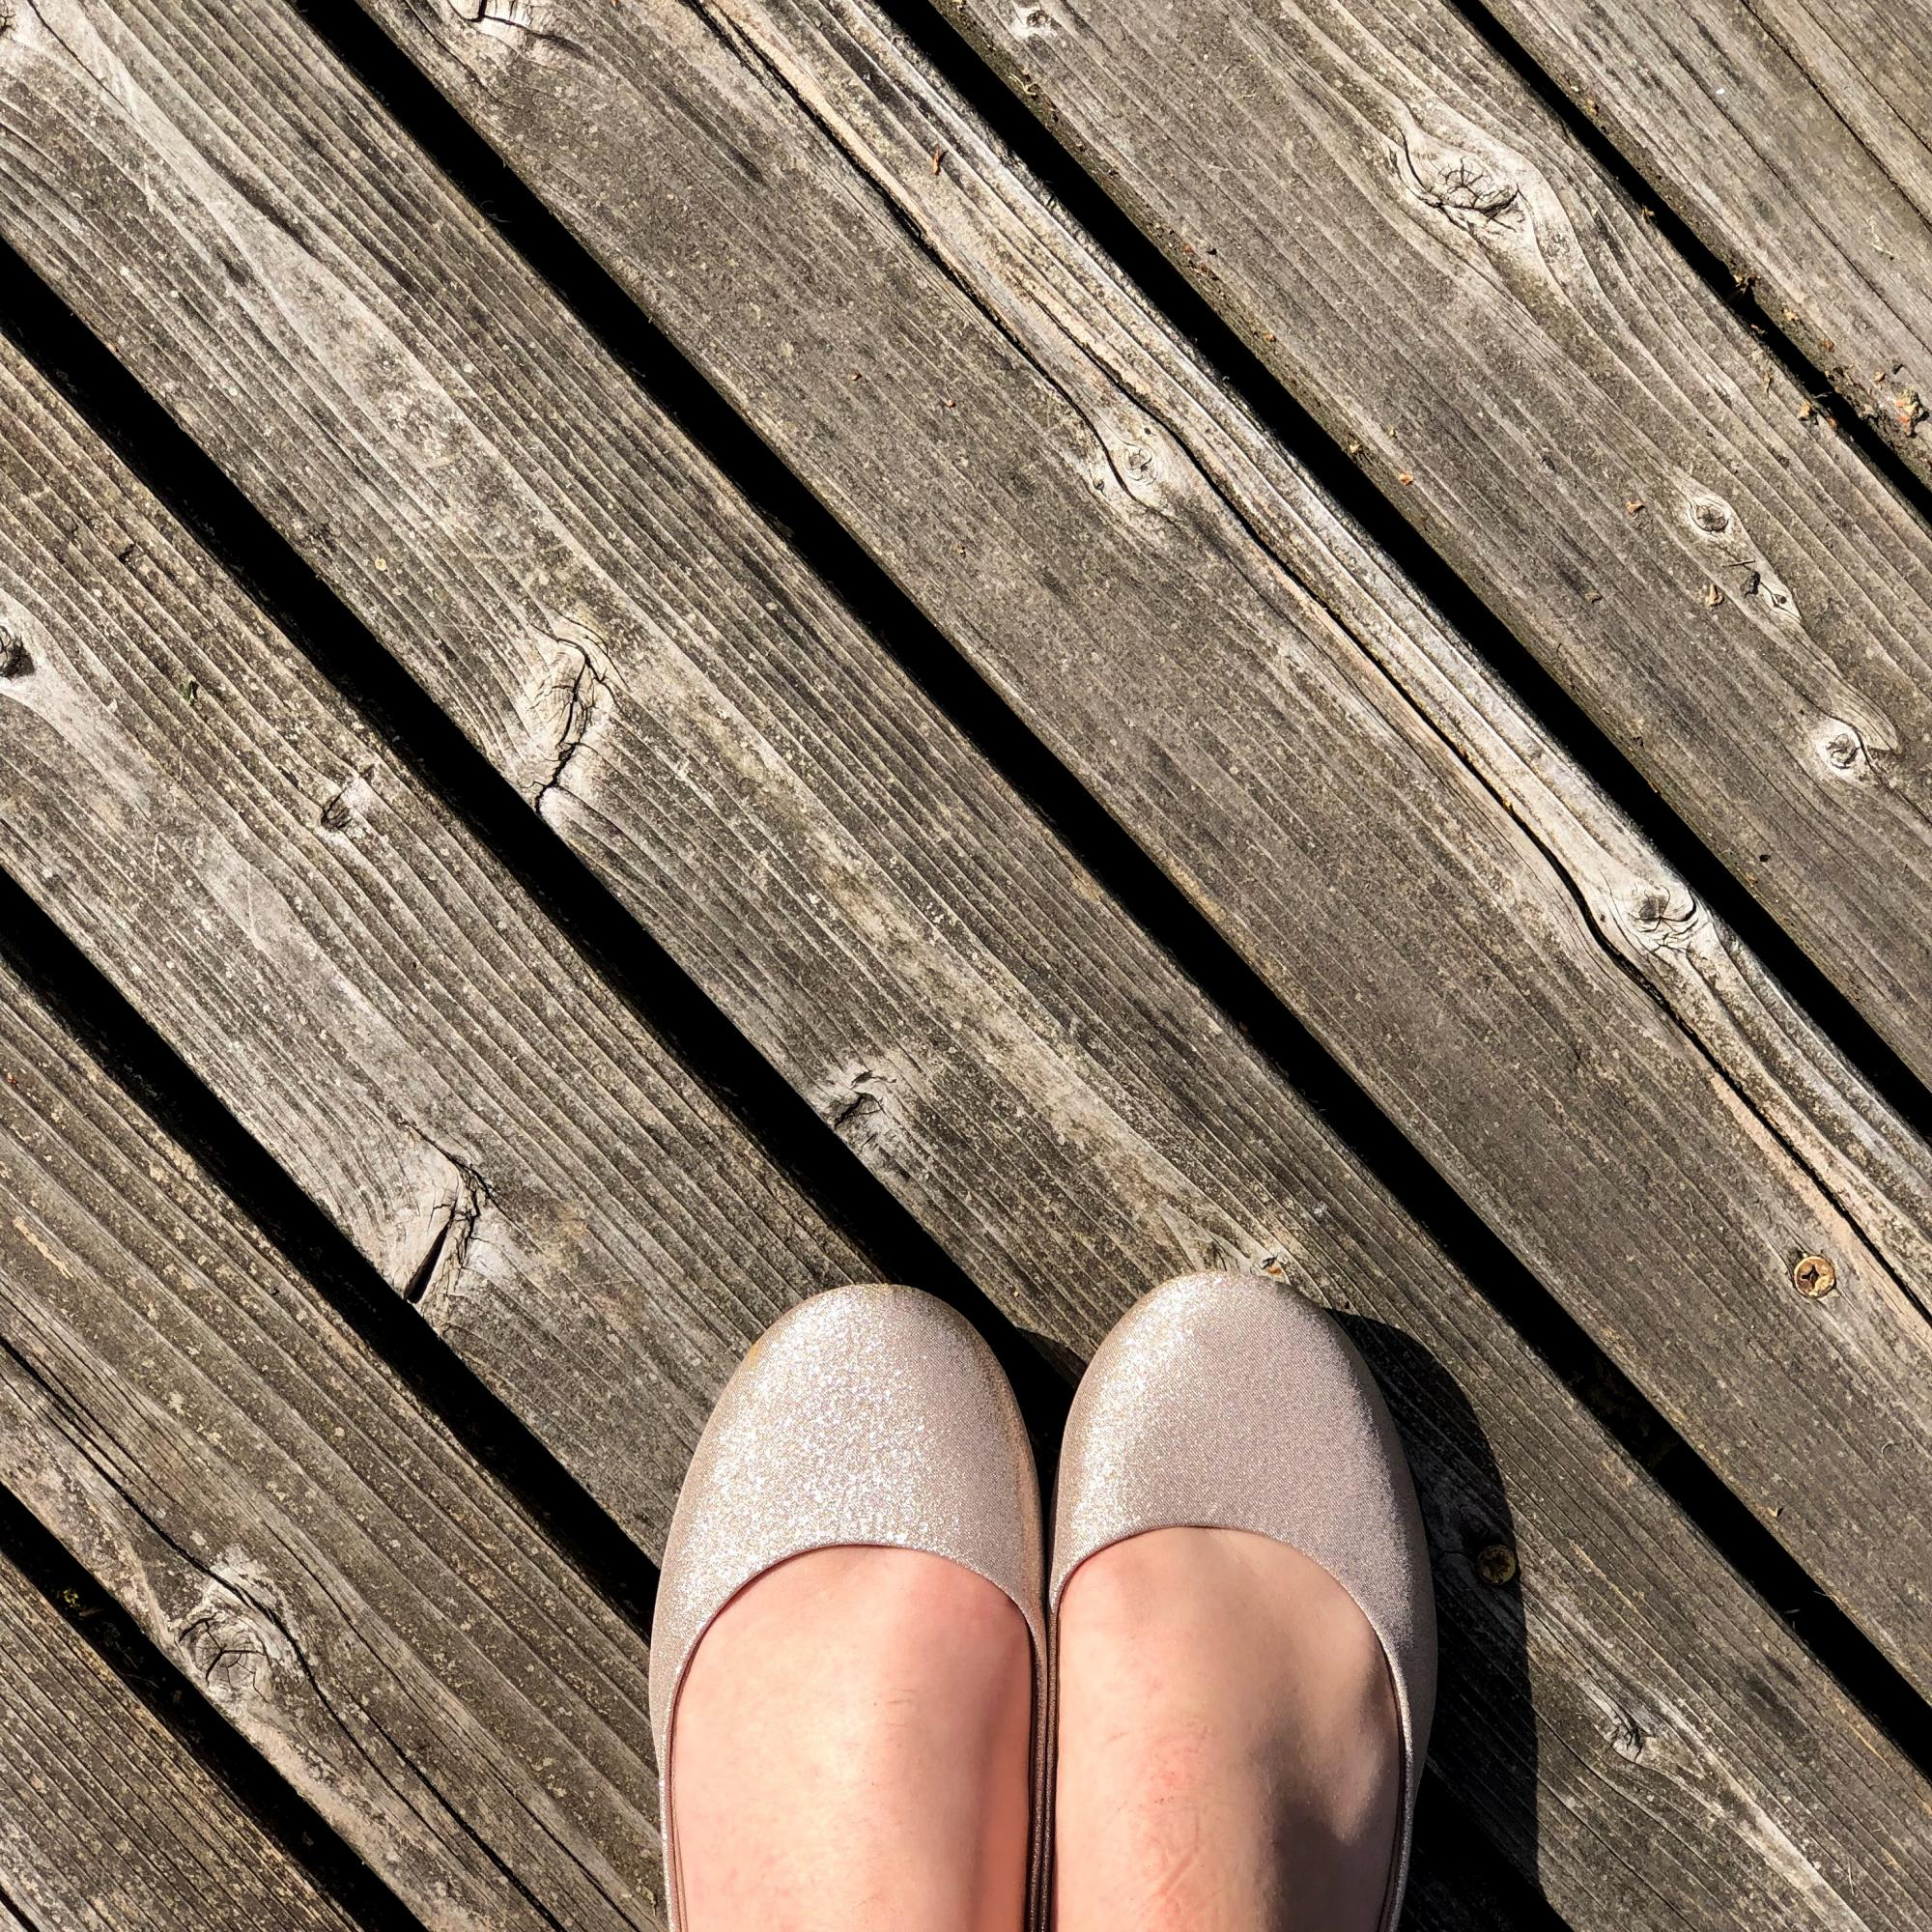 Ballet Flats on old wood deck